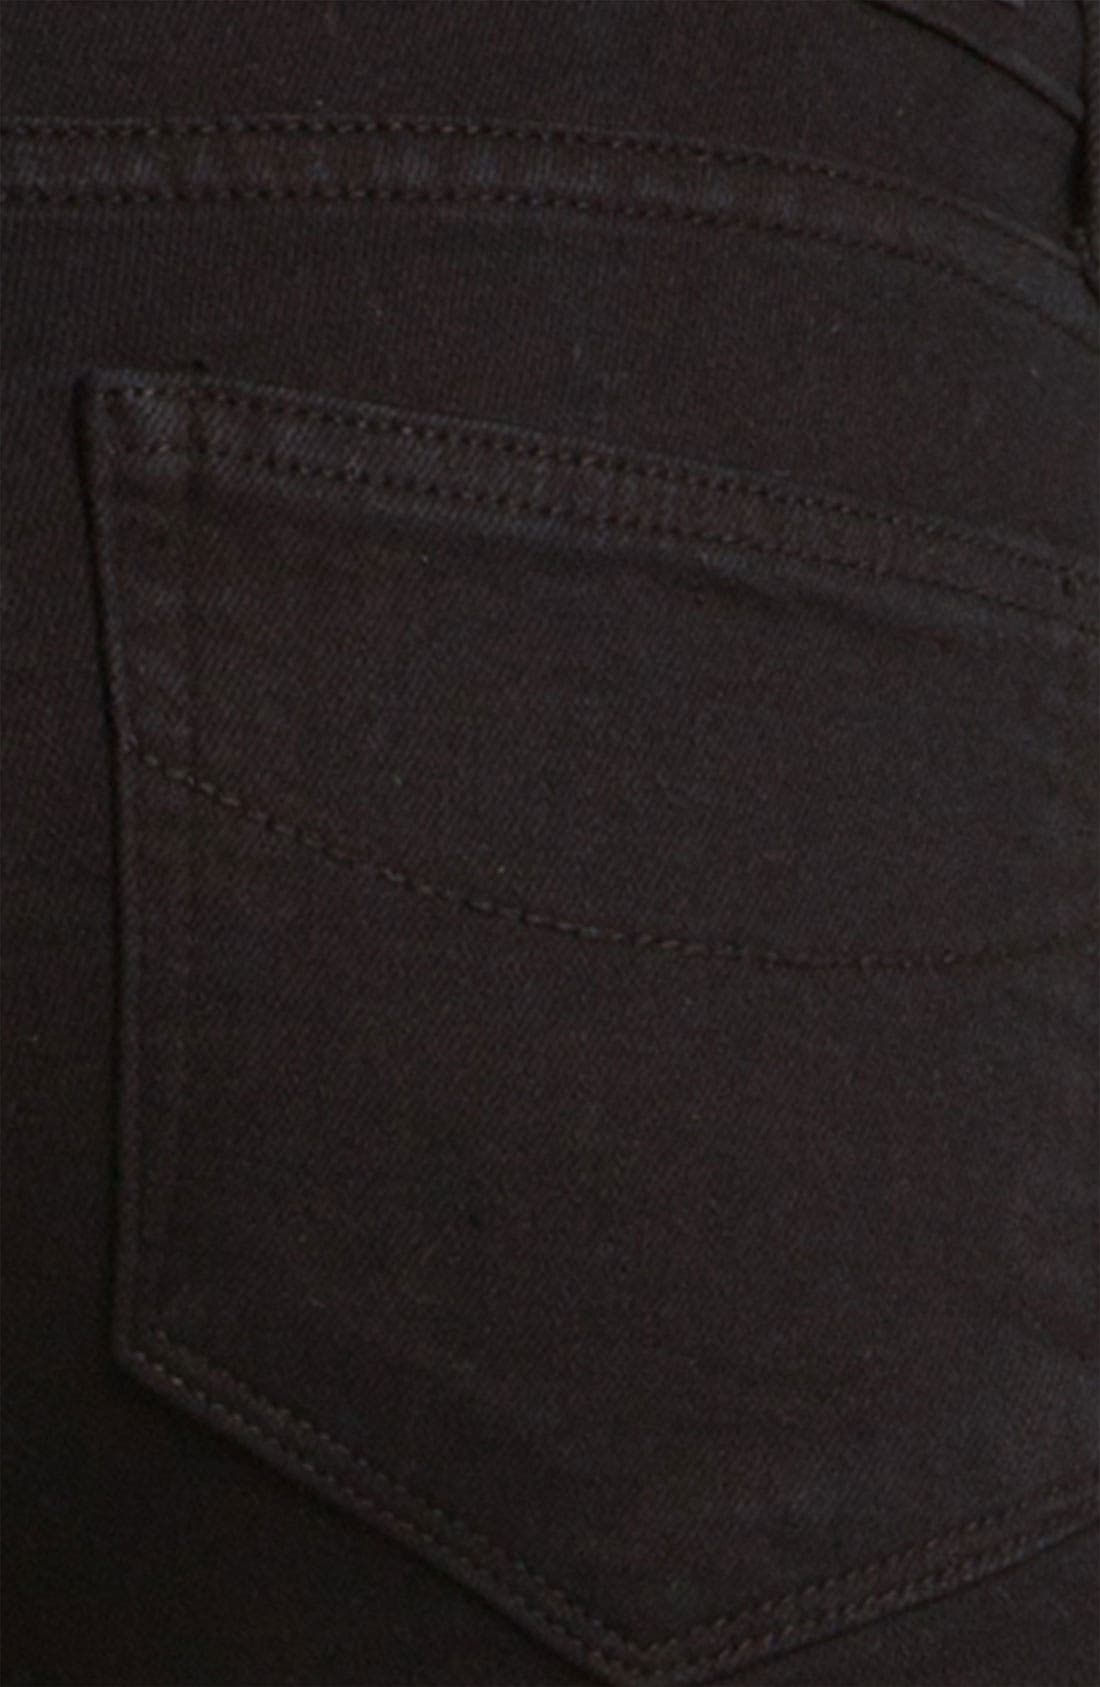 Denim 'Skyline' Straight Leg Stretch Jeans,                             Alternate thumbnail 3, color,                             001